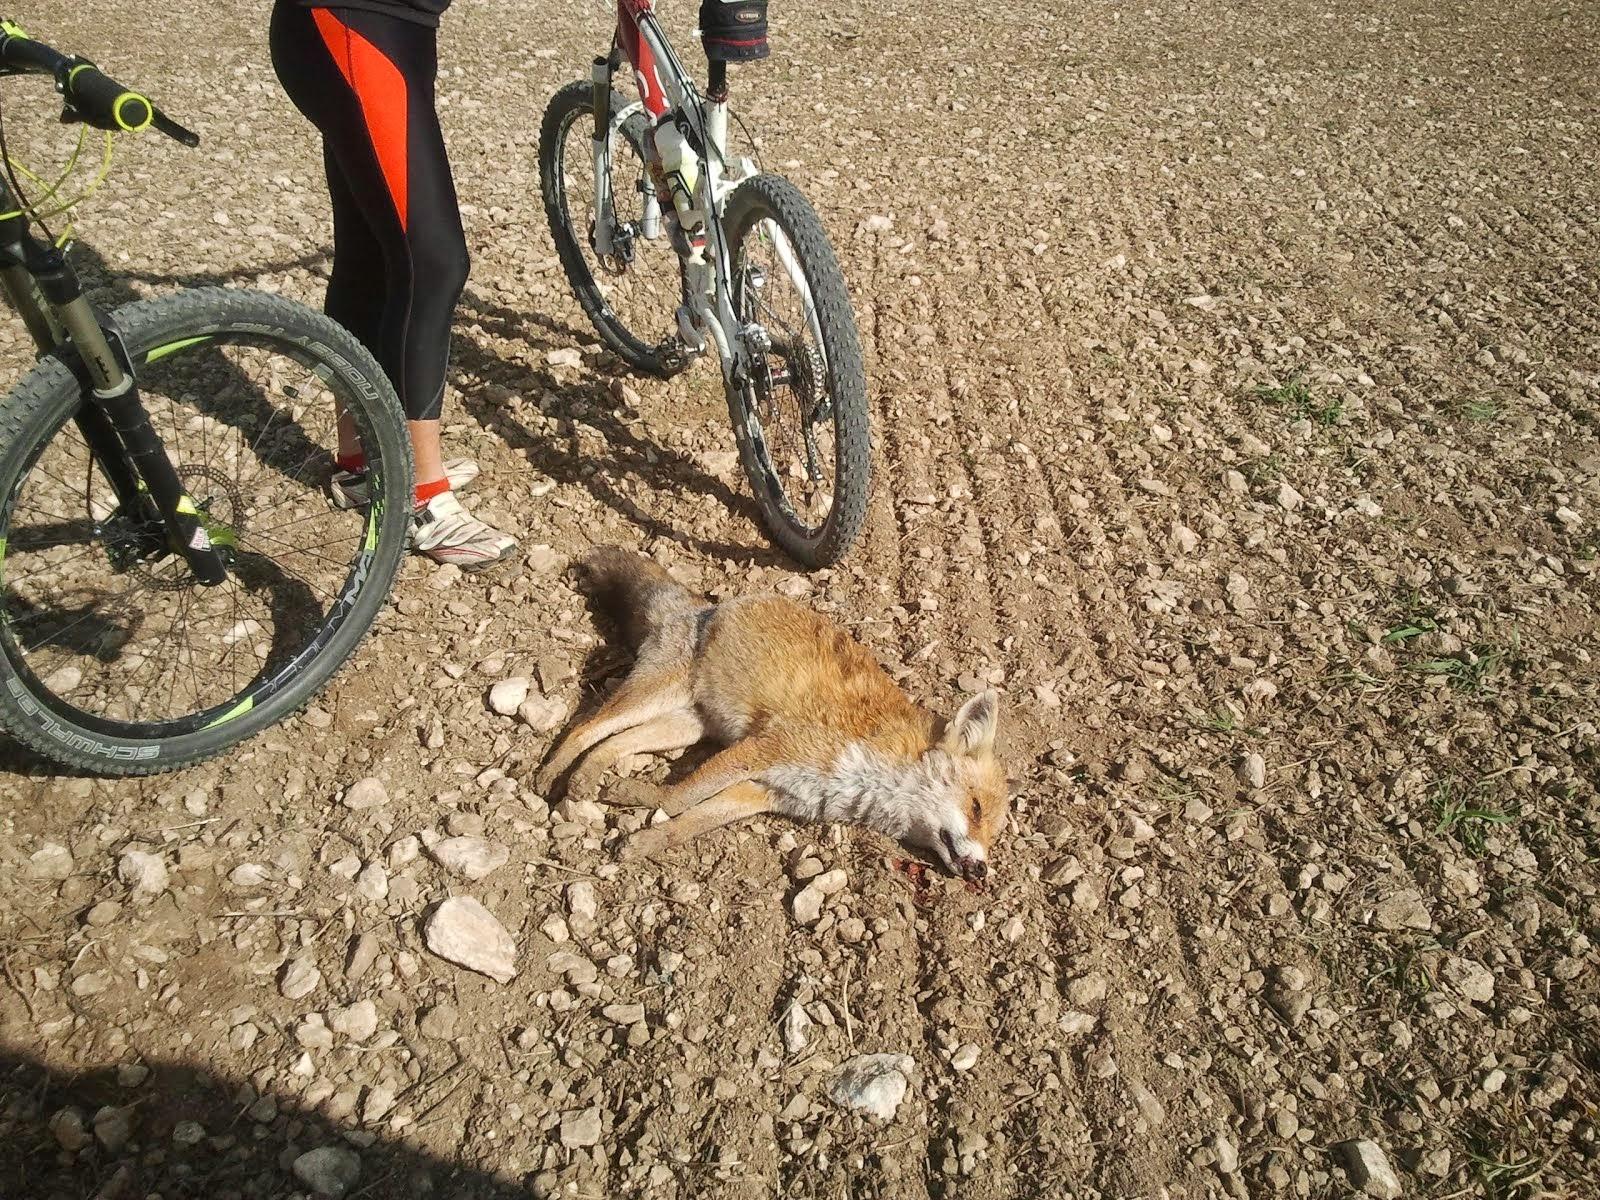 Zorra abatida por un cazador hoy mismo. 02.11.2014